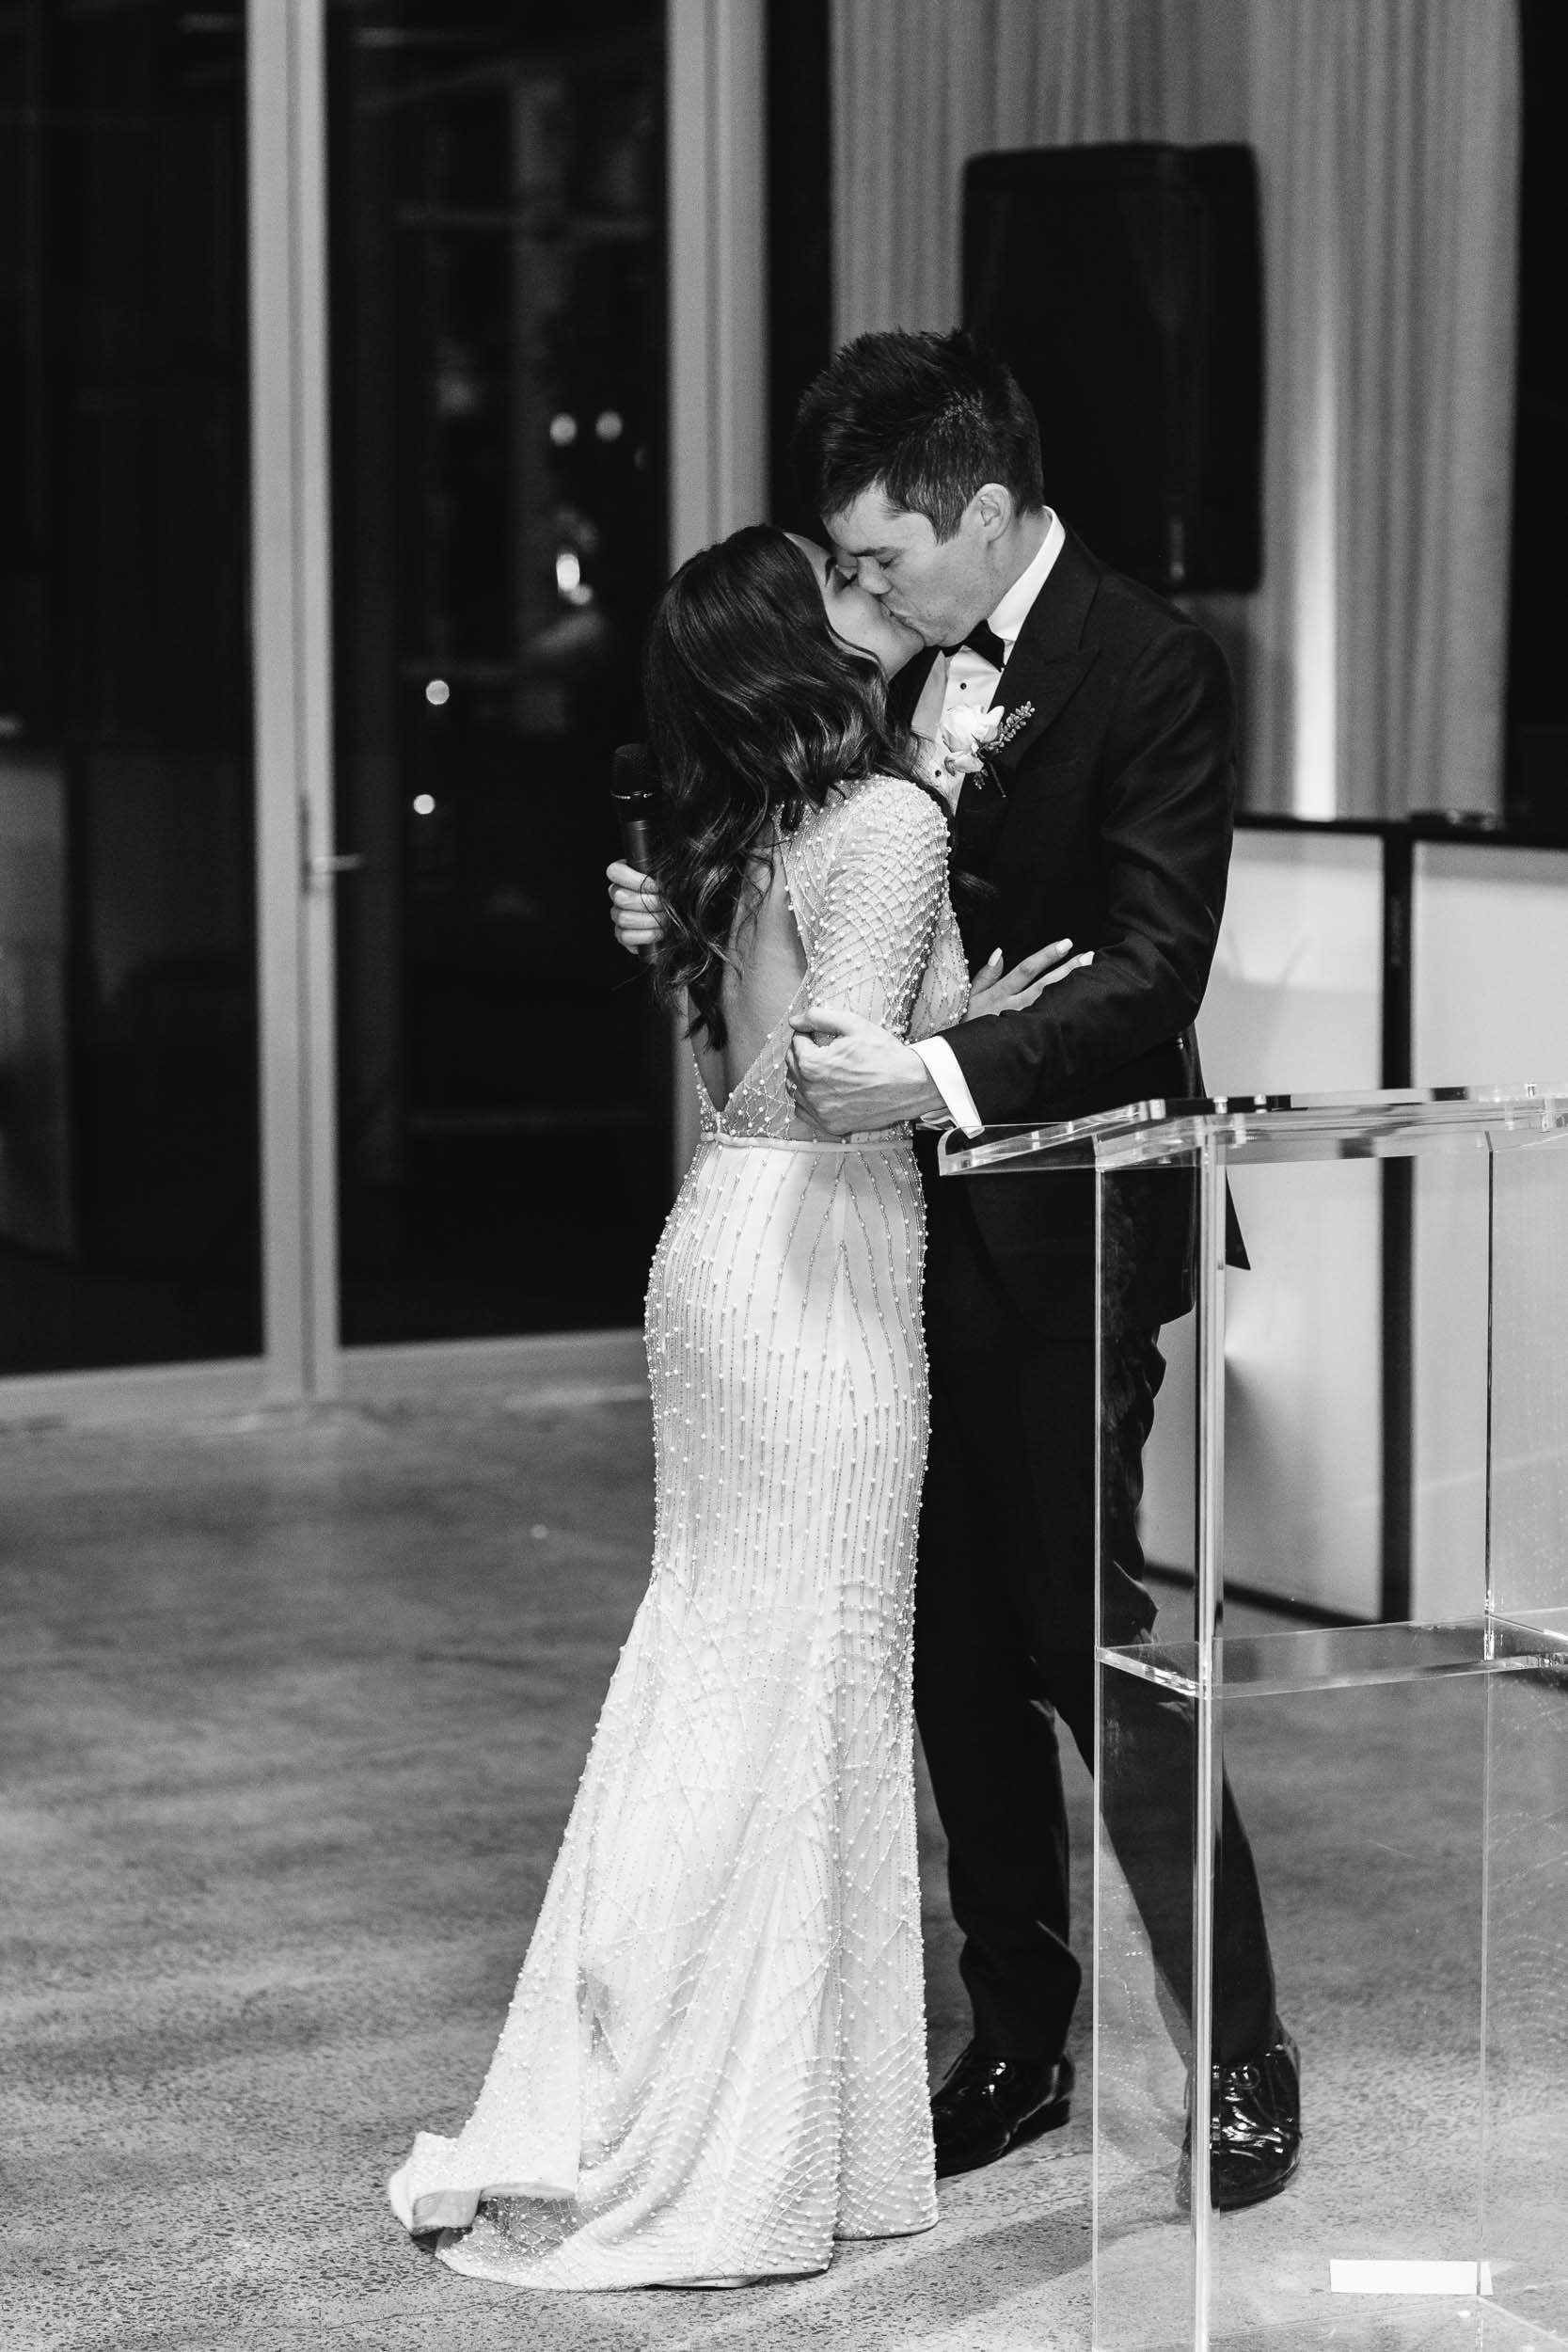 Kas-Richards-Wedding-Photographer-Melbourne-City-Wedding-Alto-Event-Space-Jane-Hill-Bridal-Gown-68.jpg